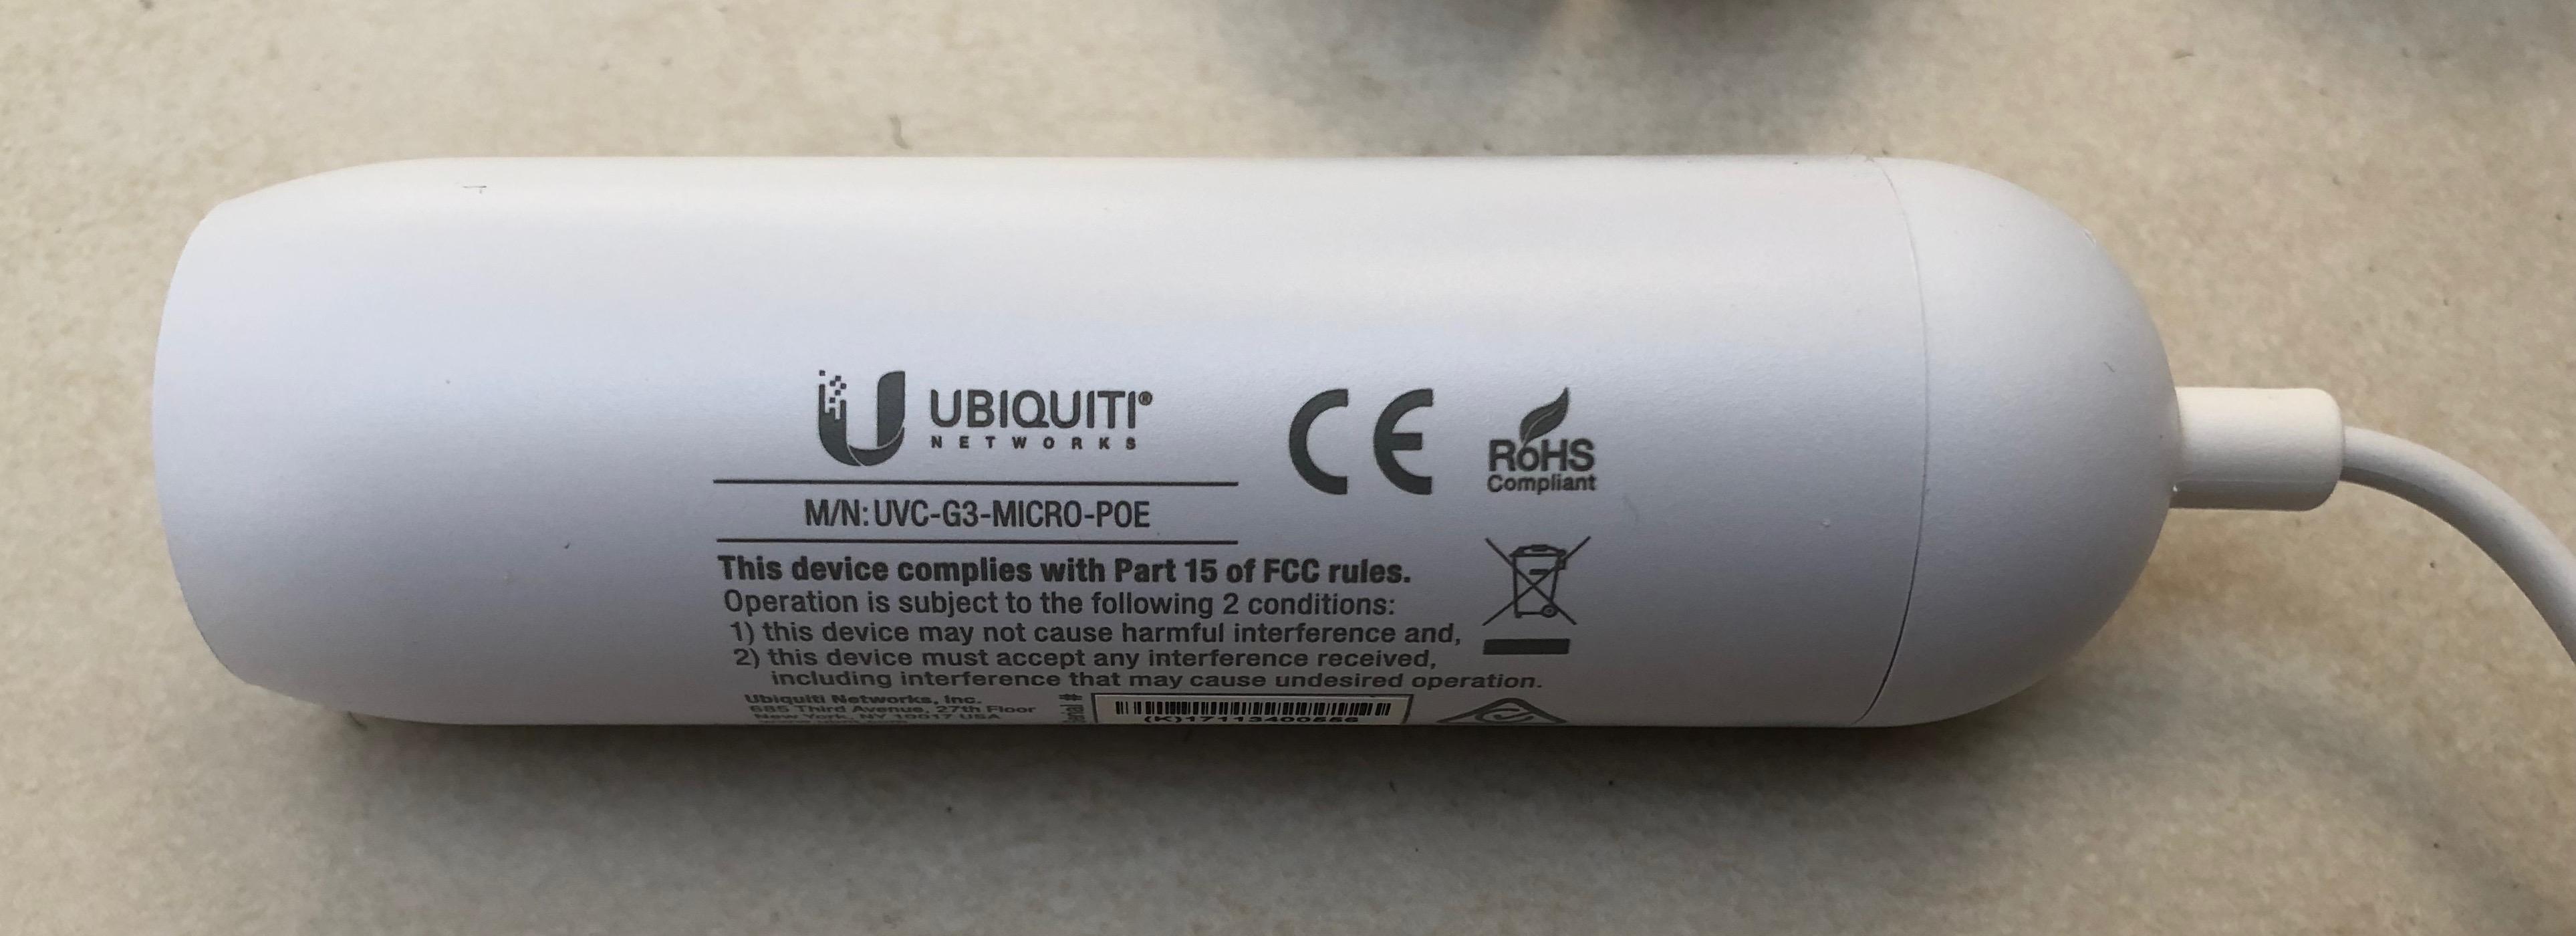 POE Adapter für die UniFi Micro G3 Kamera